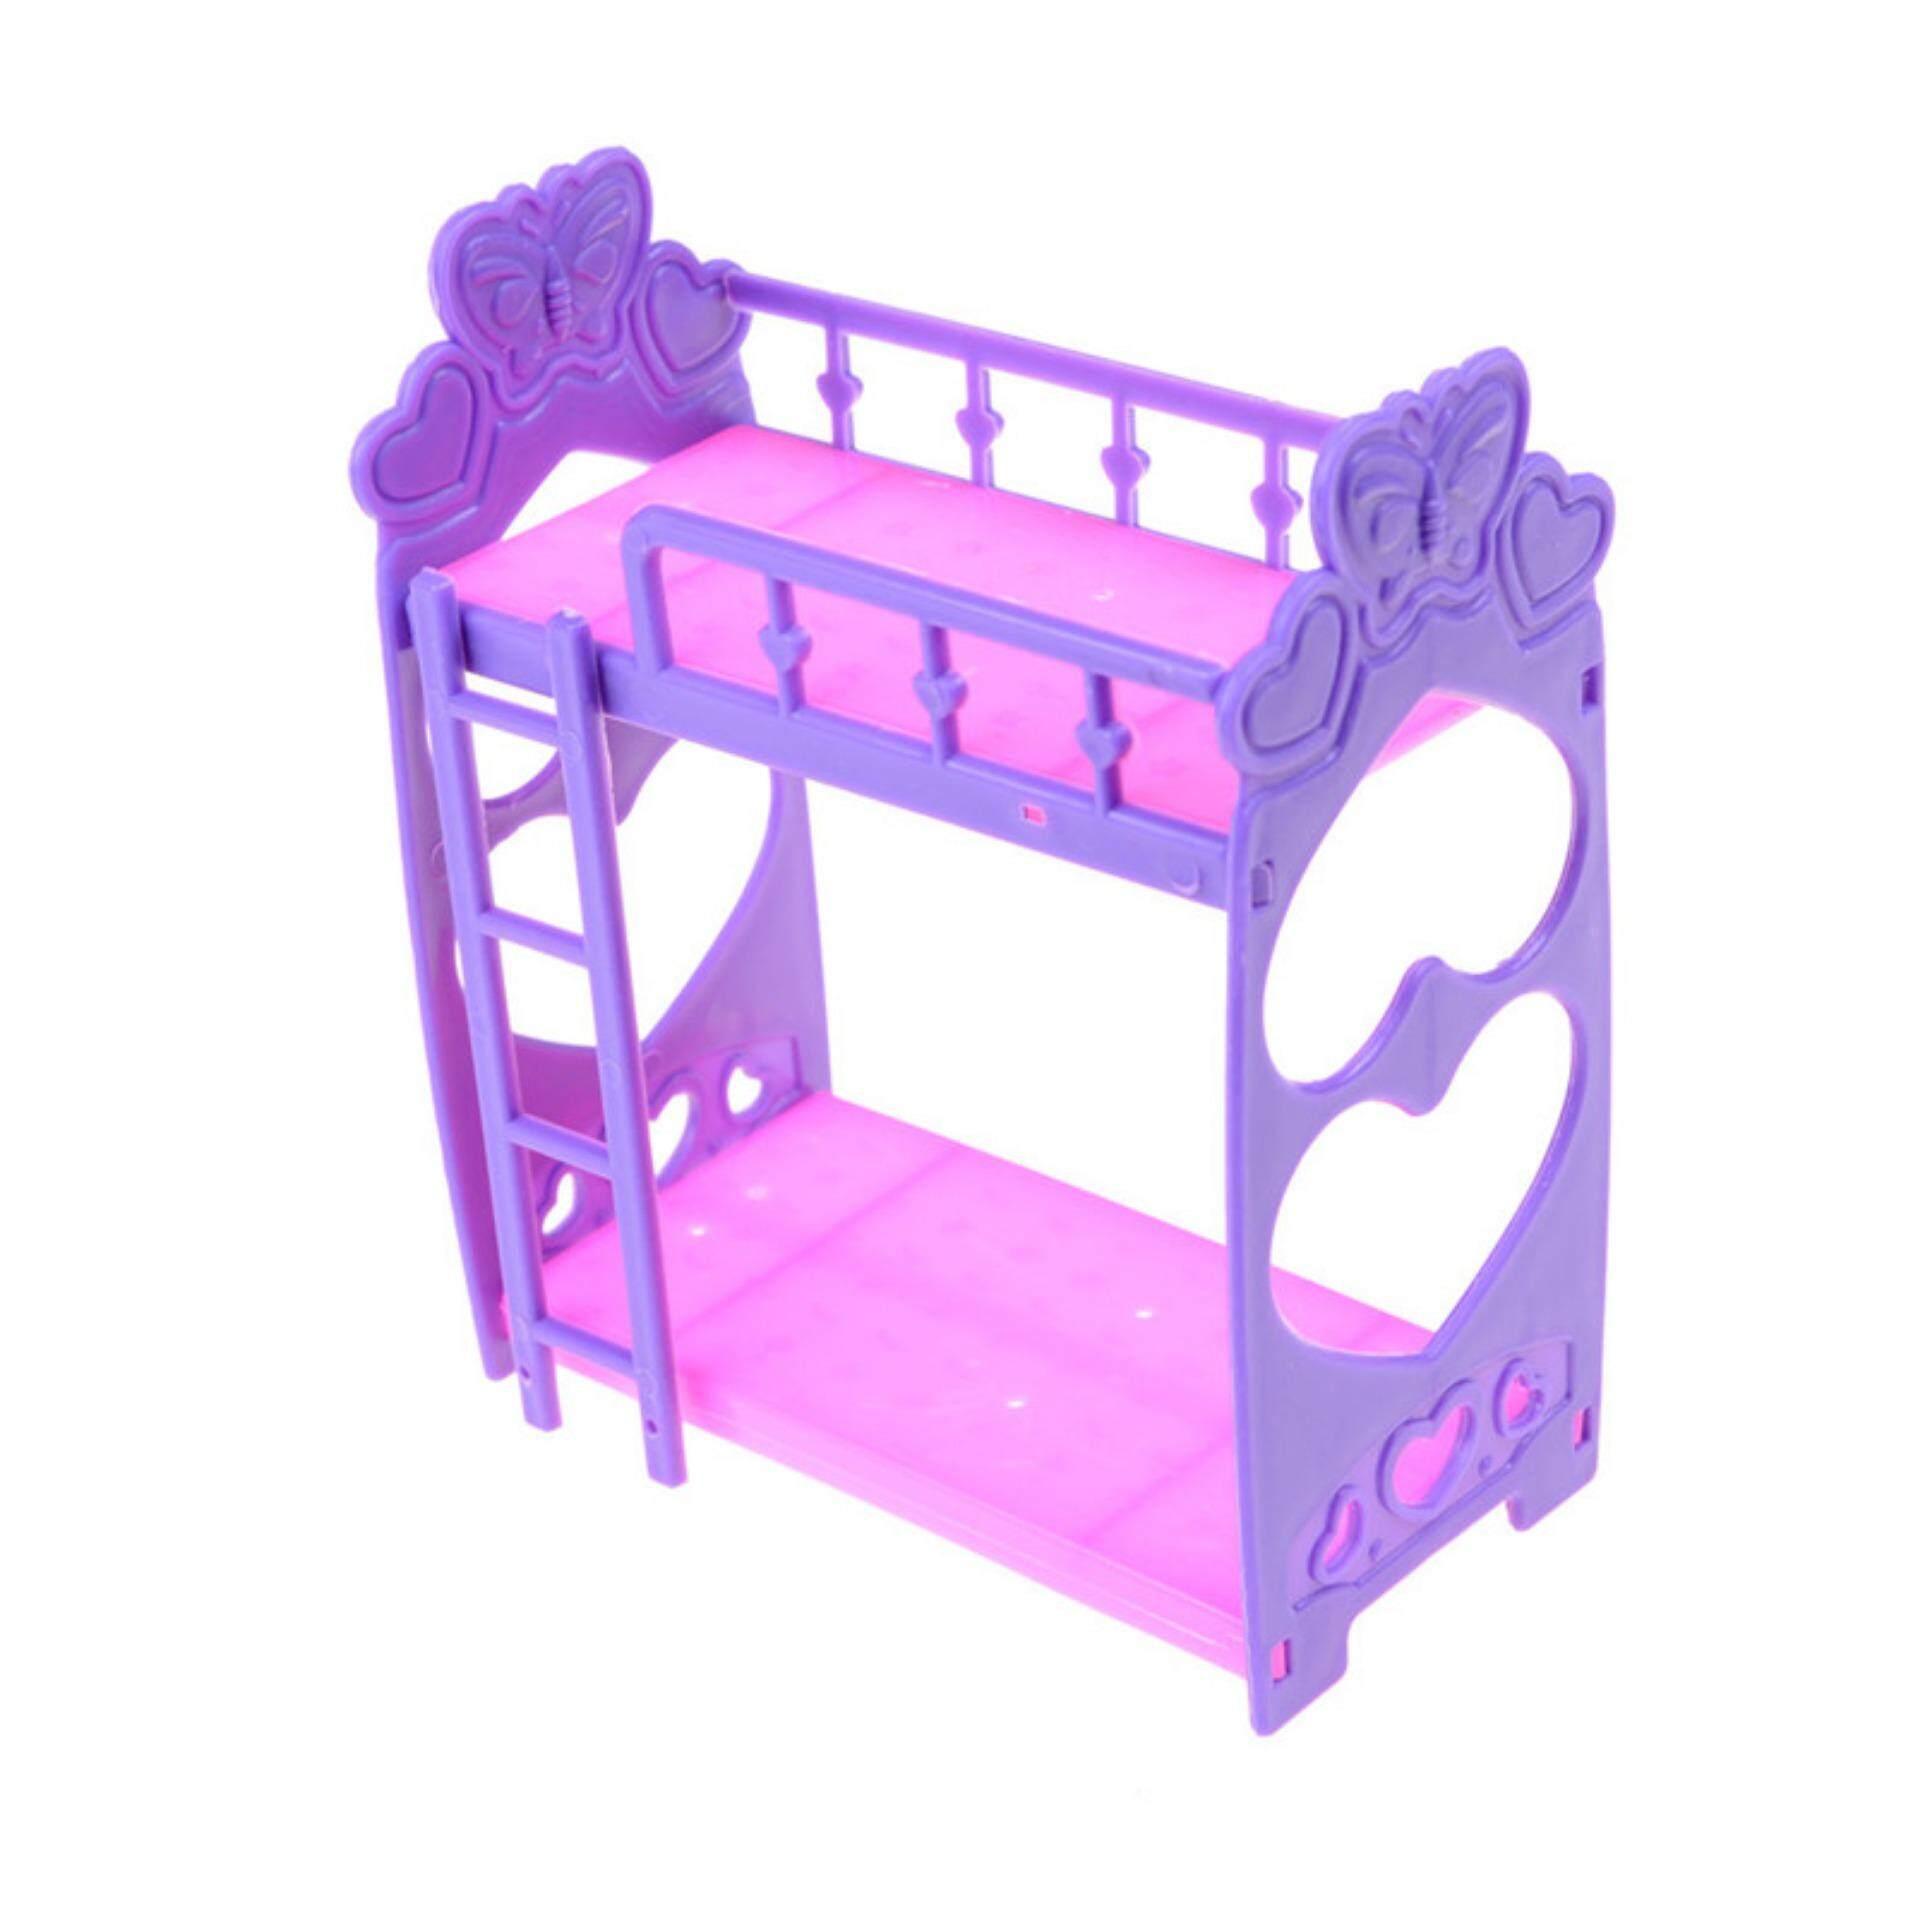 Buy Sell Cheapest Mainan Mimpi Sy156 Best Quality Product Deals Rumah Rumahan Set Miniatur Plastik Kasur Furniture Untuk Boneka Barbie Lemari